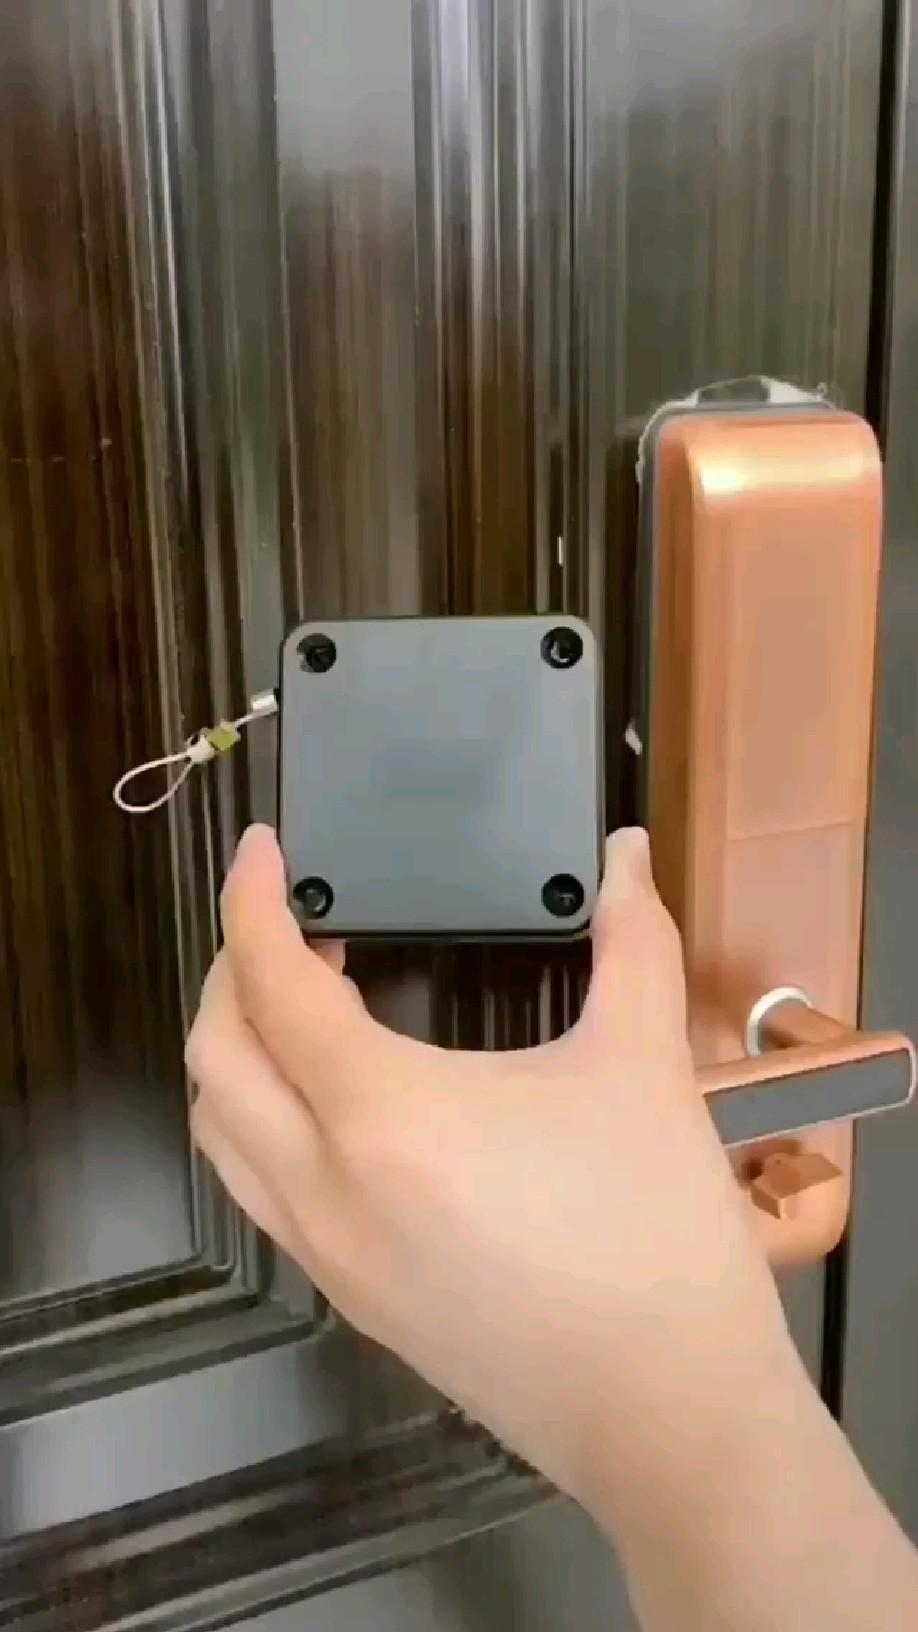 Useful gadget  Home items,new gadget, Smart gadget, Amazon finds